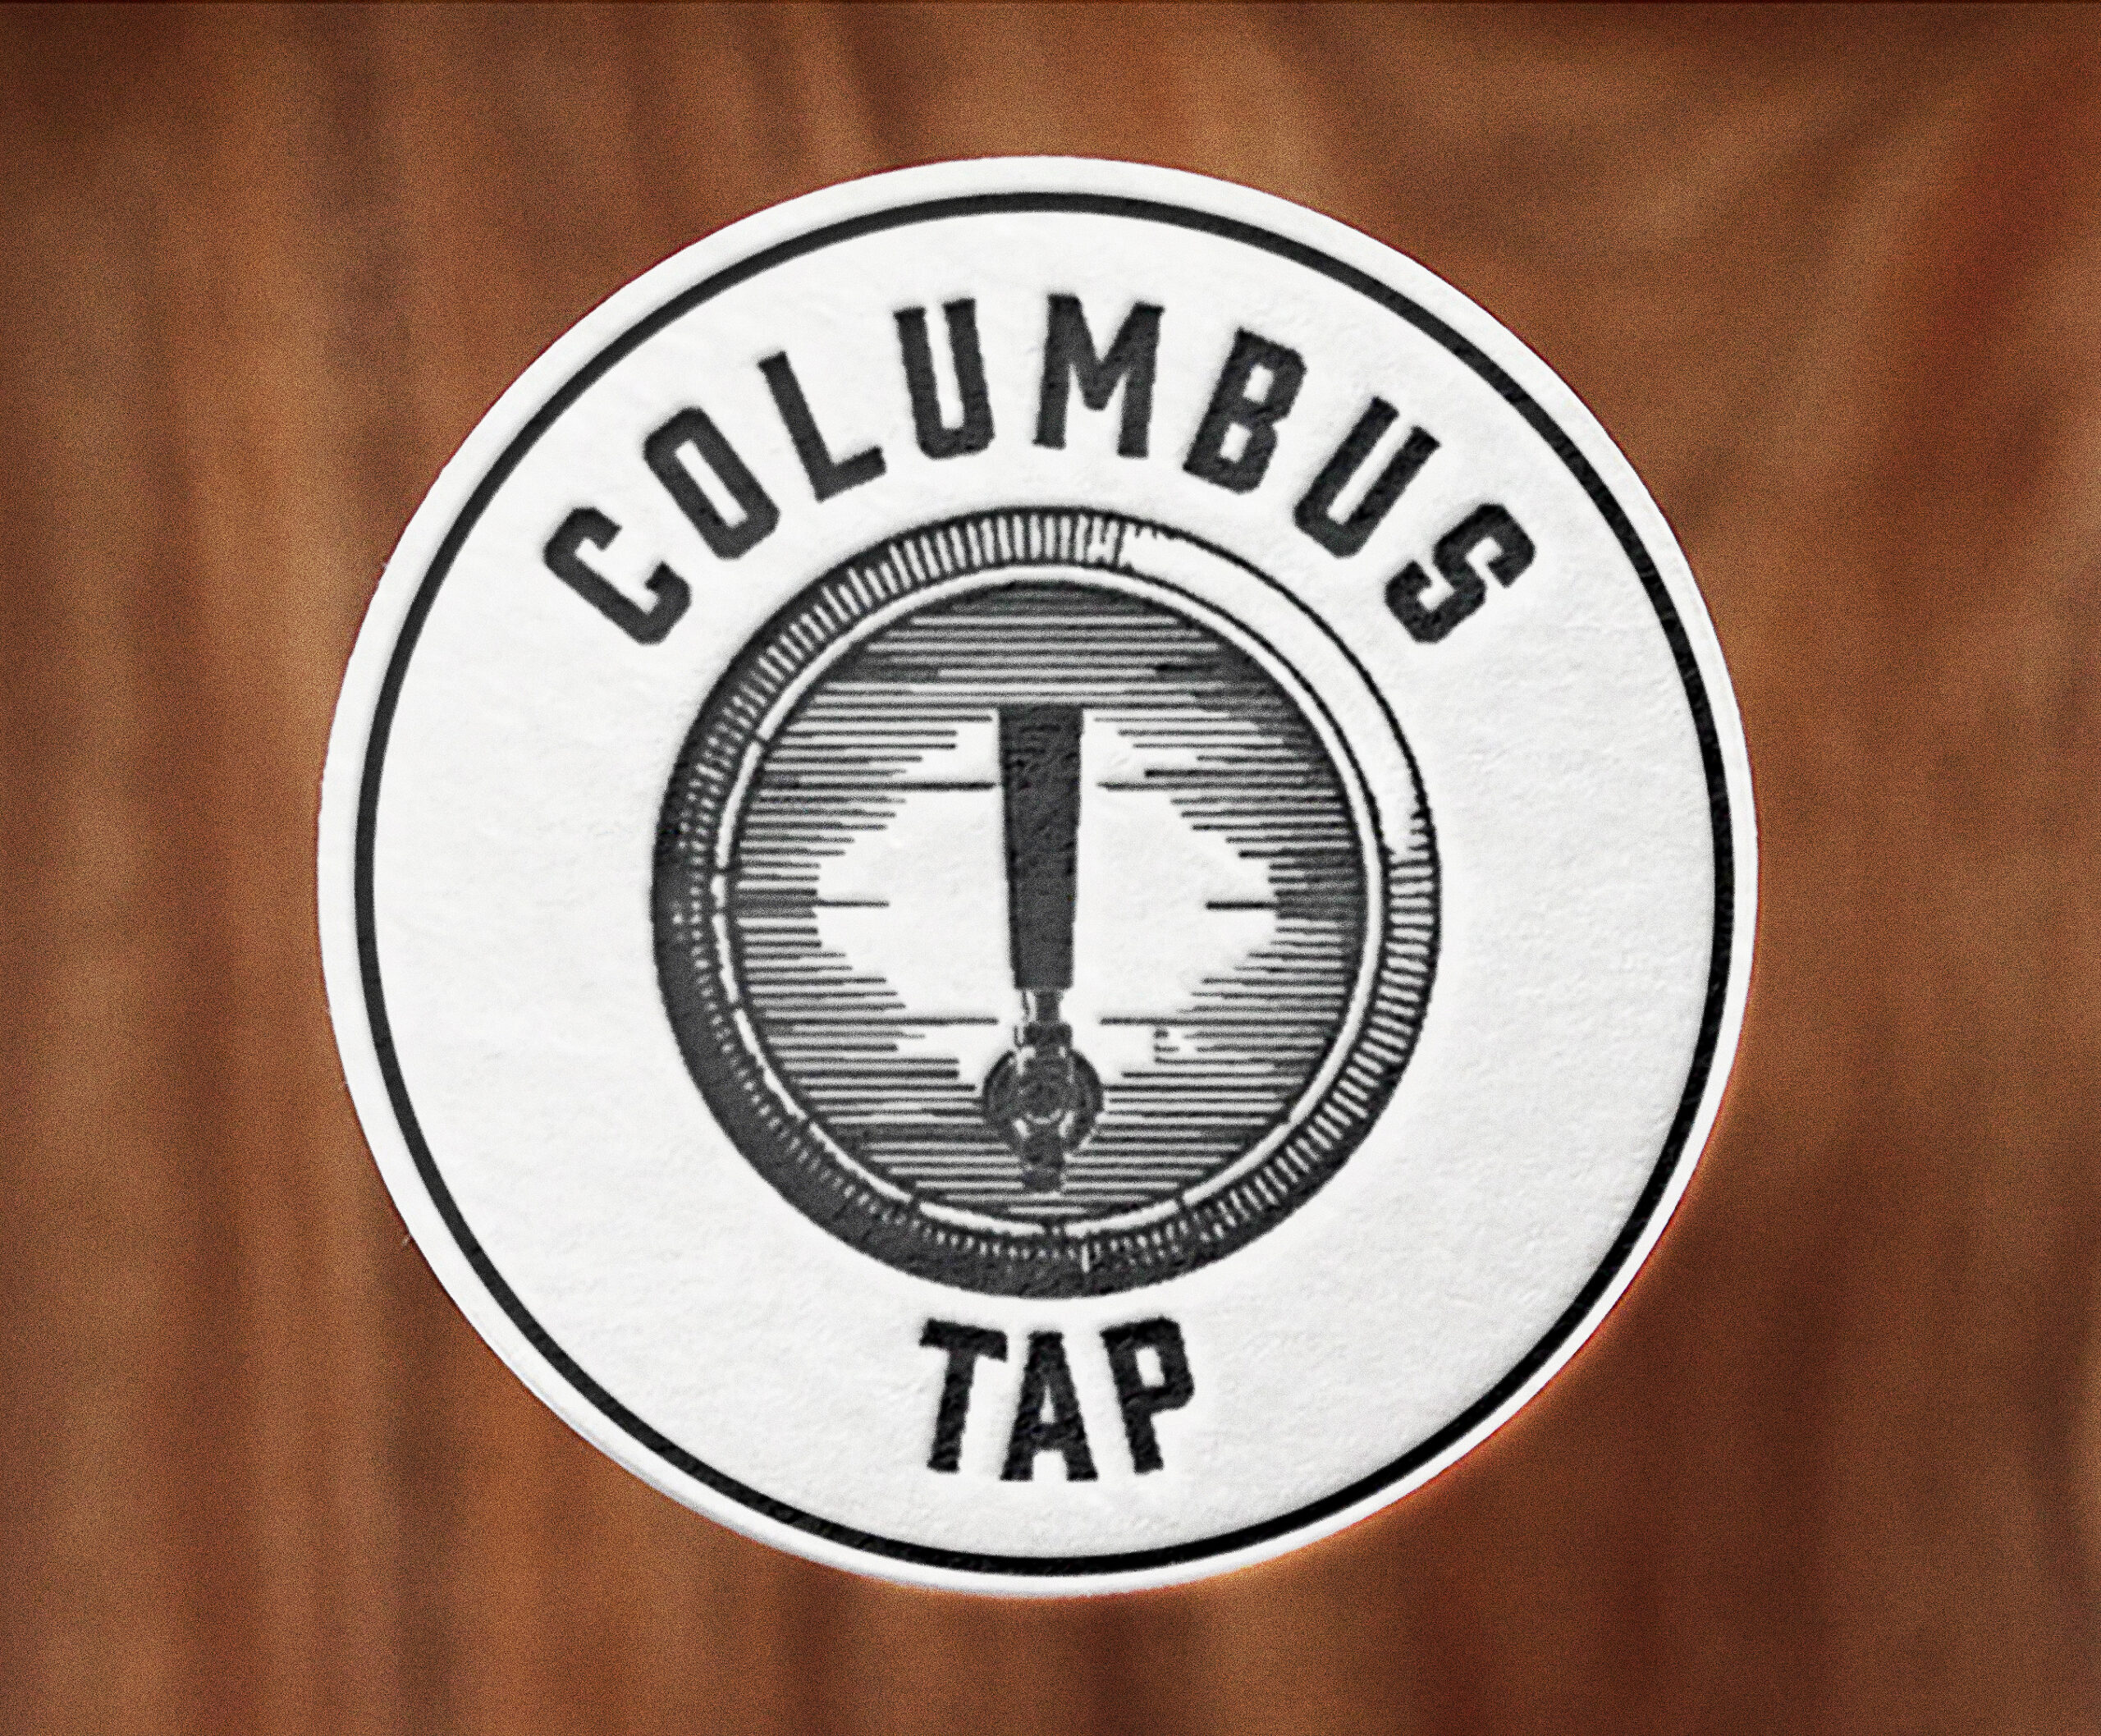 RBS_Columbus_Tap_Coaster